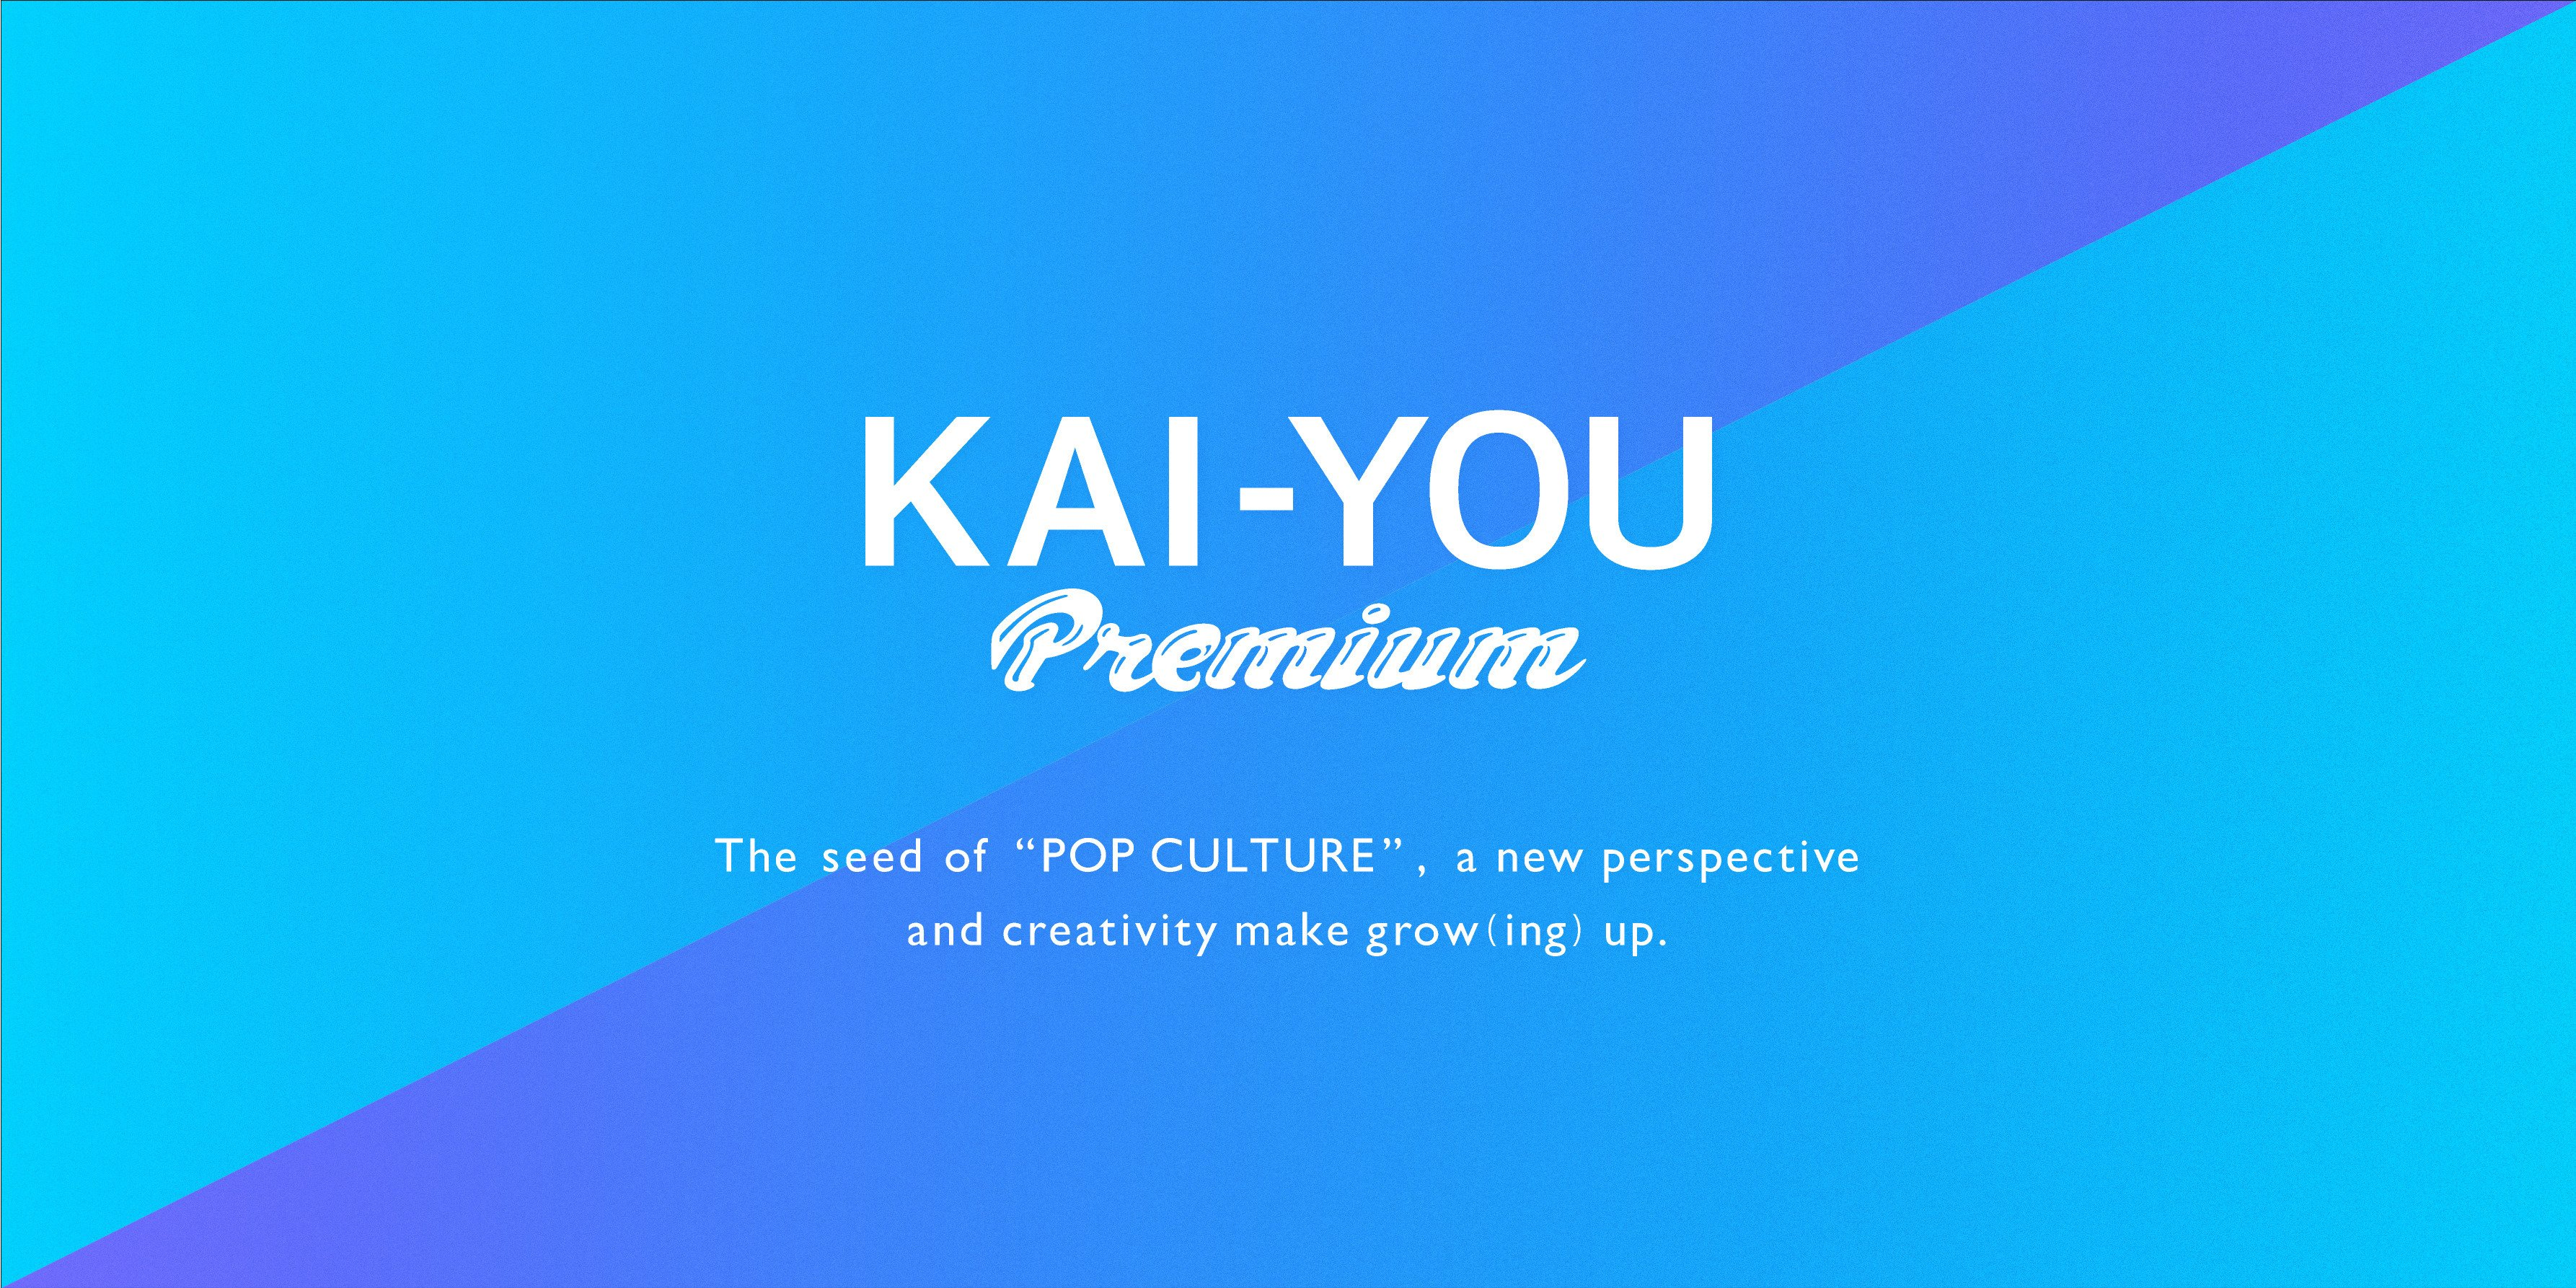 KAI-YOU Premiumの料金システムを一部改定いたしました